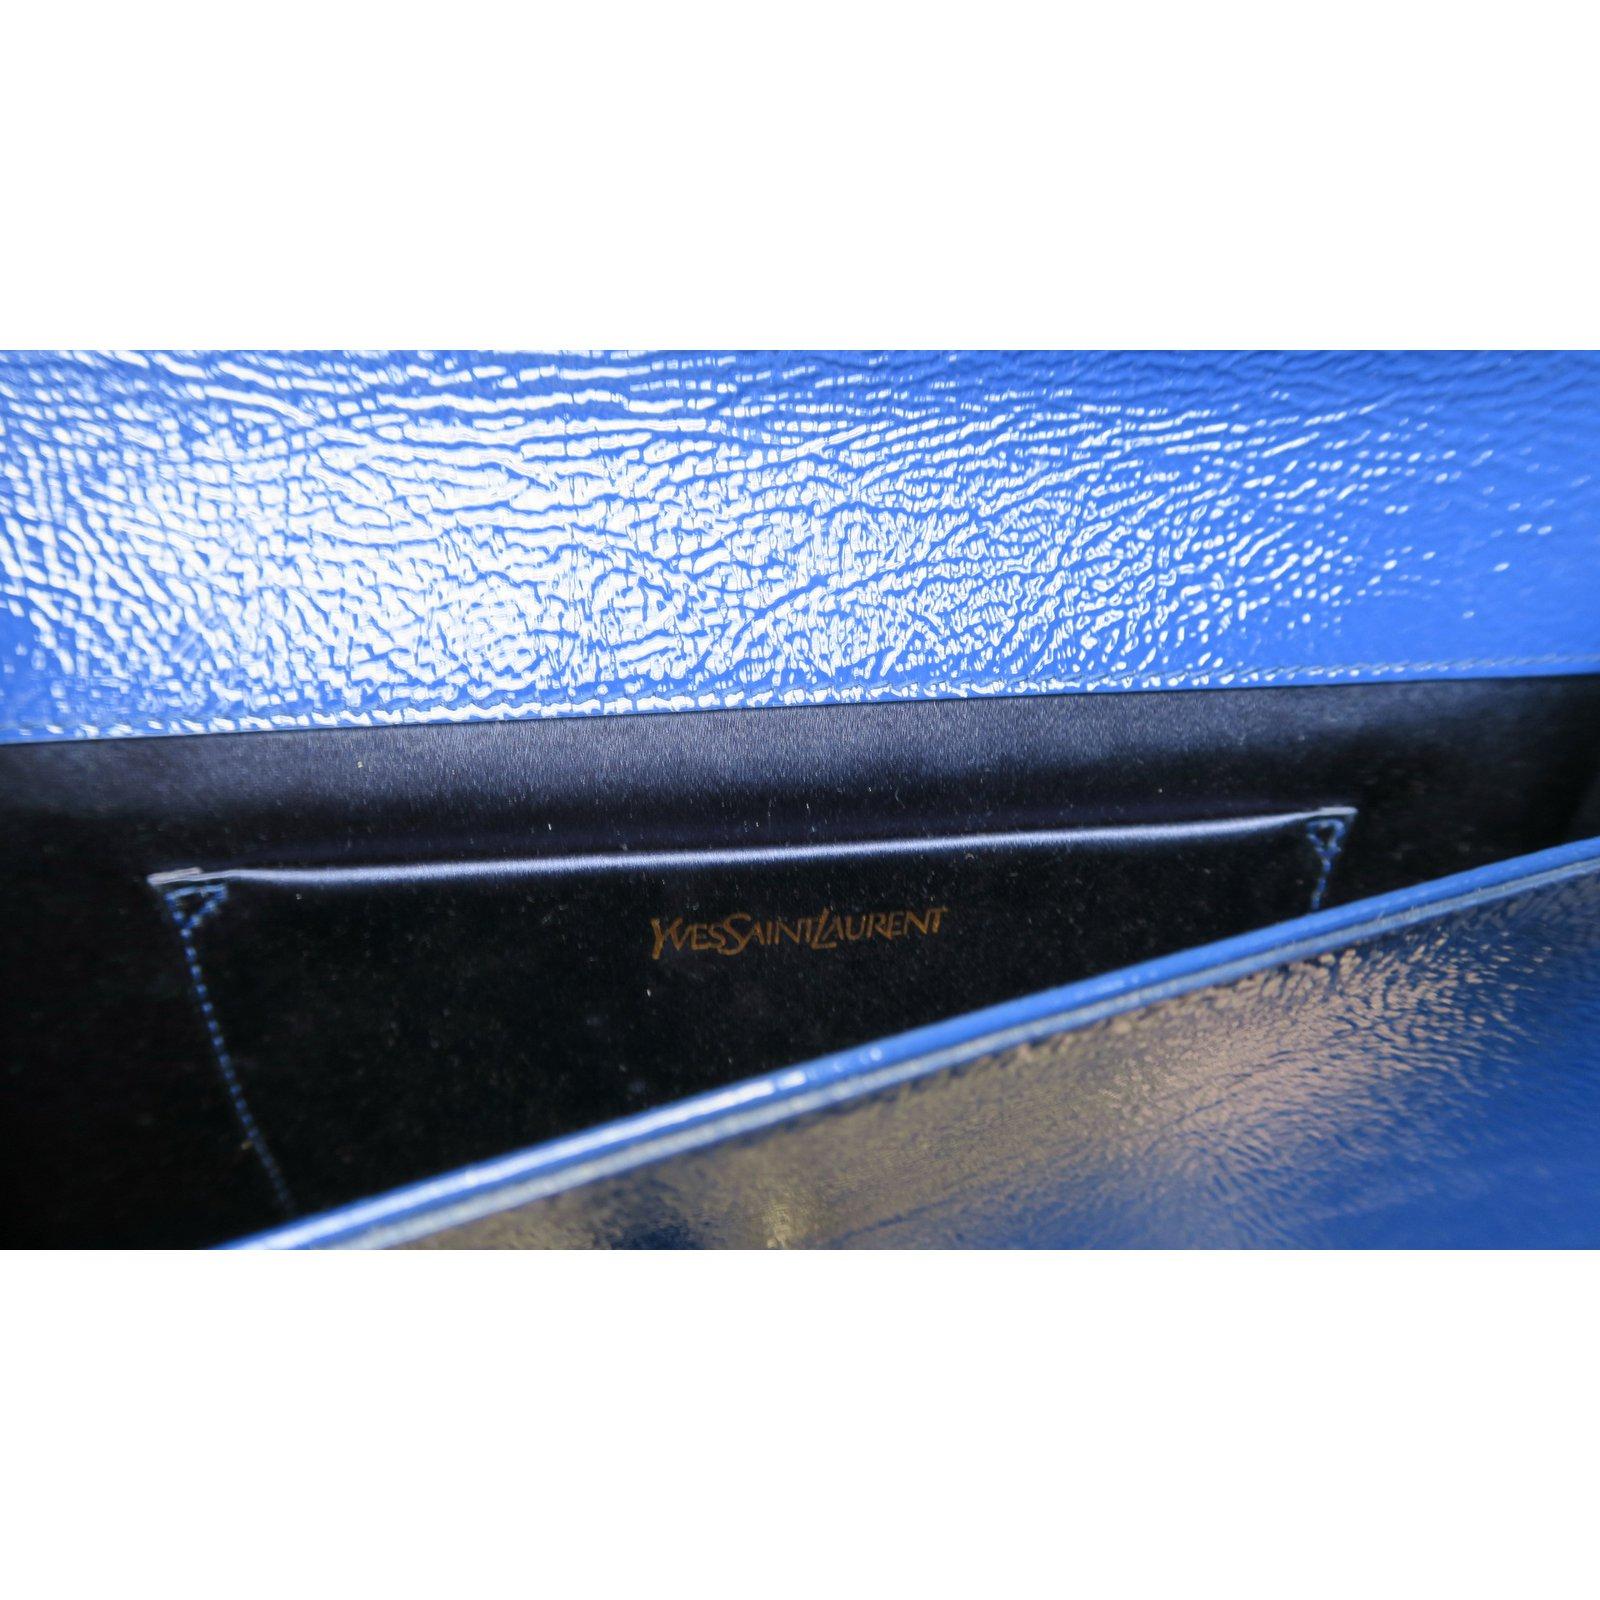 c884059a6b Yves Saint Laurent Clutch bags Clutch bags Patent leather Blue ref.19318 -  Joli Closet